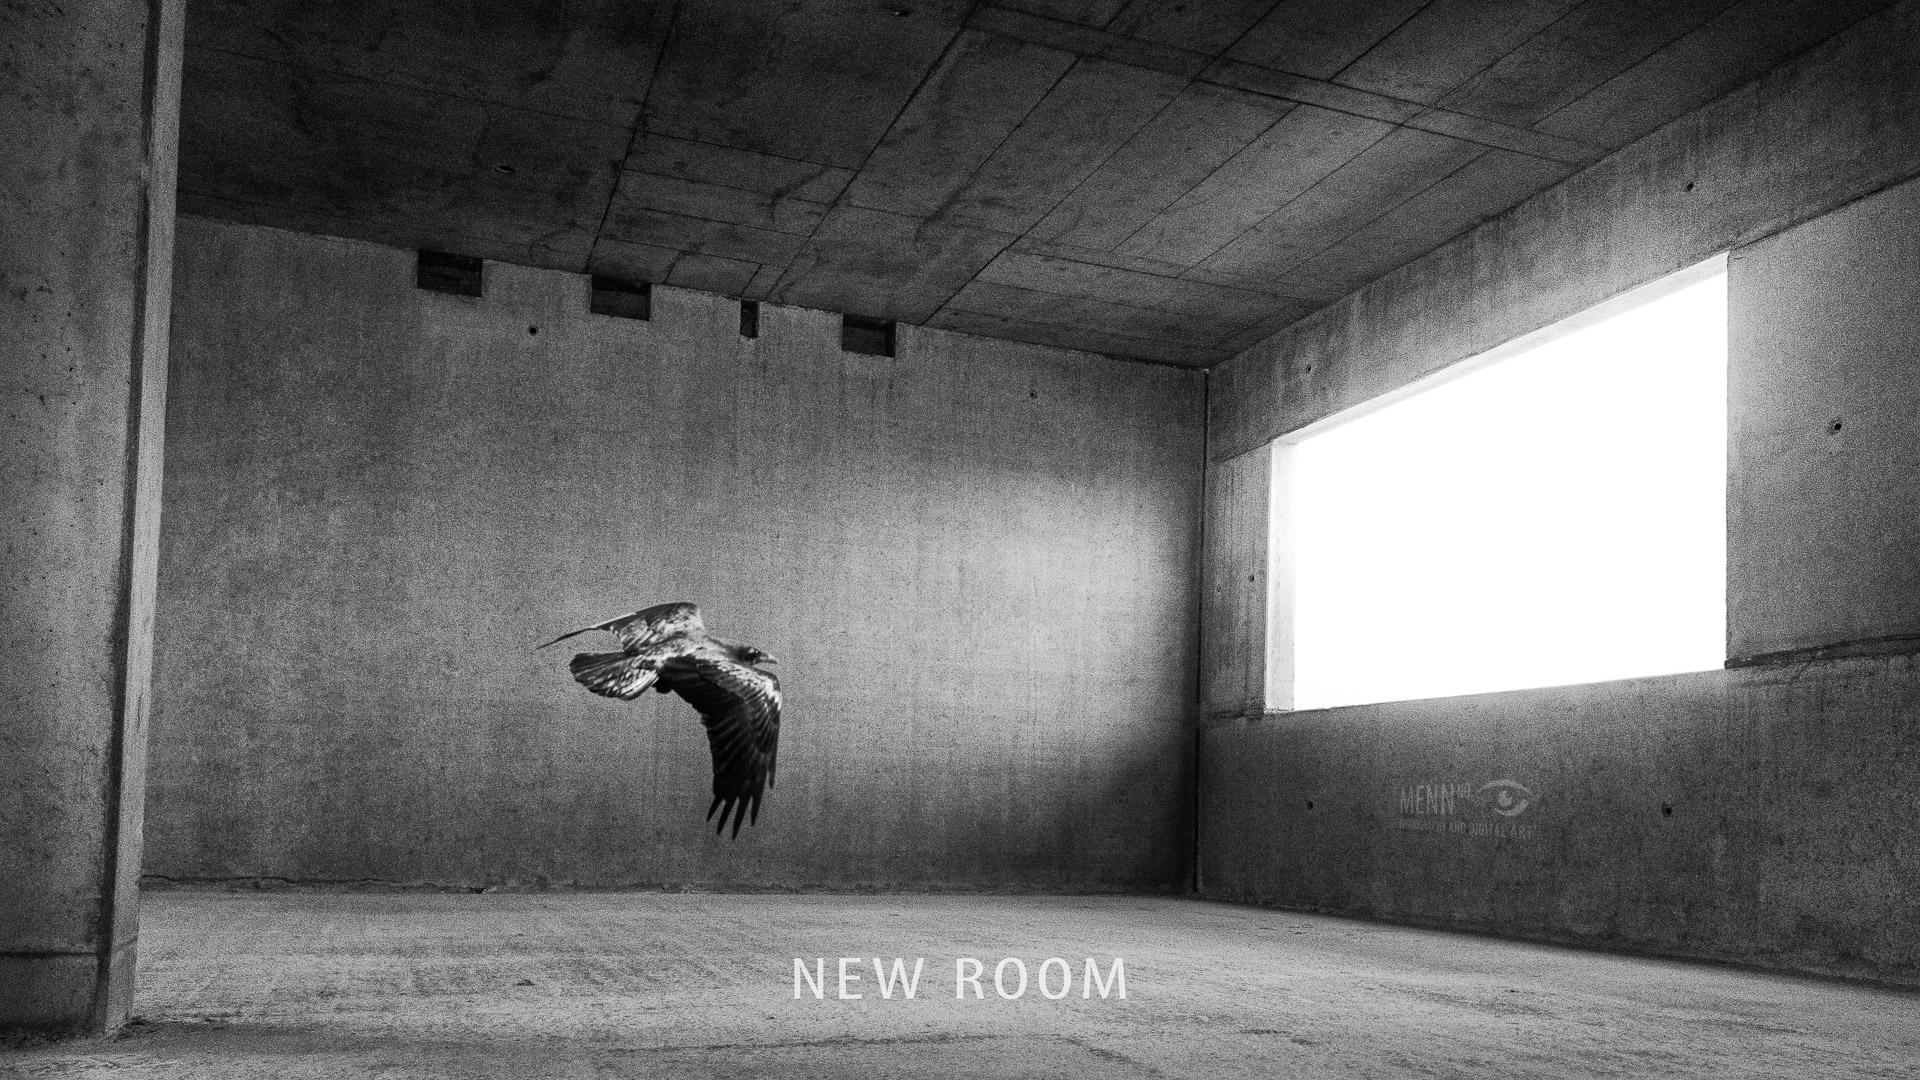 newroom-mennno